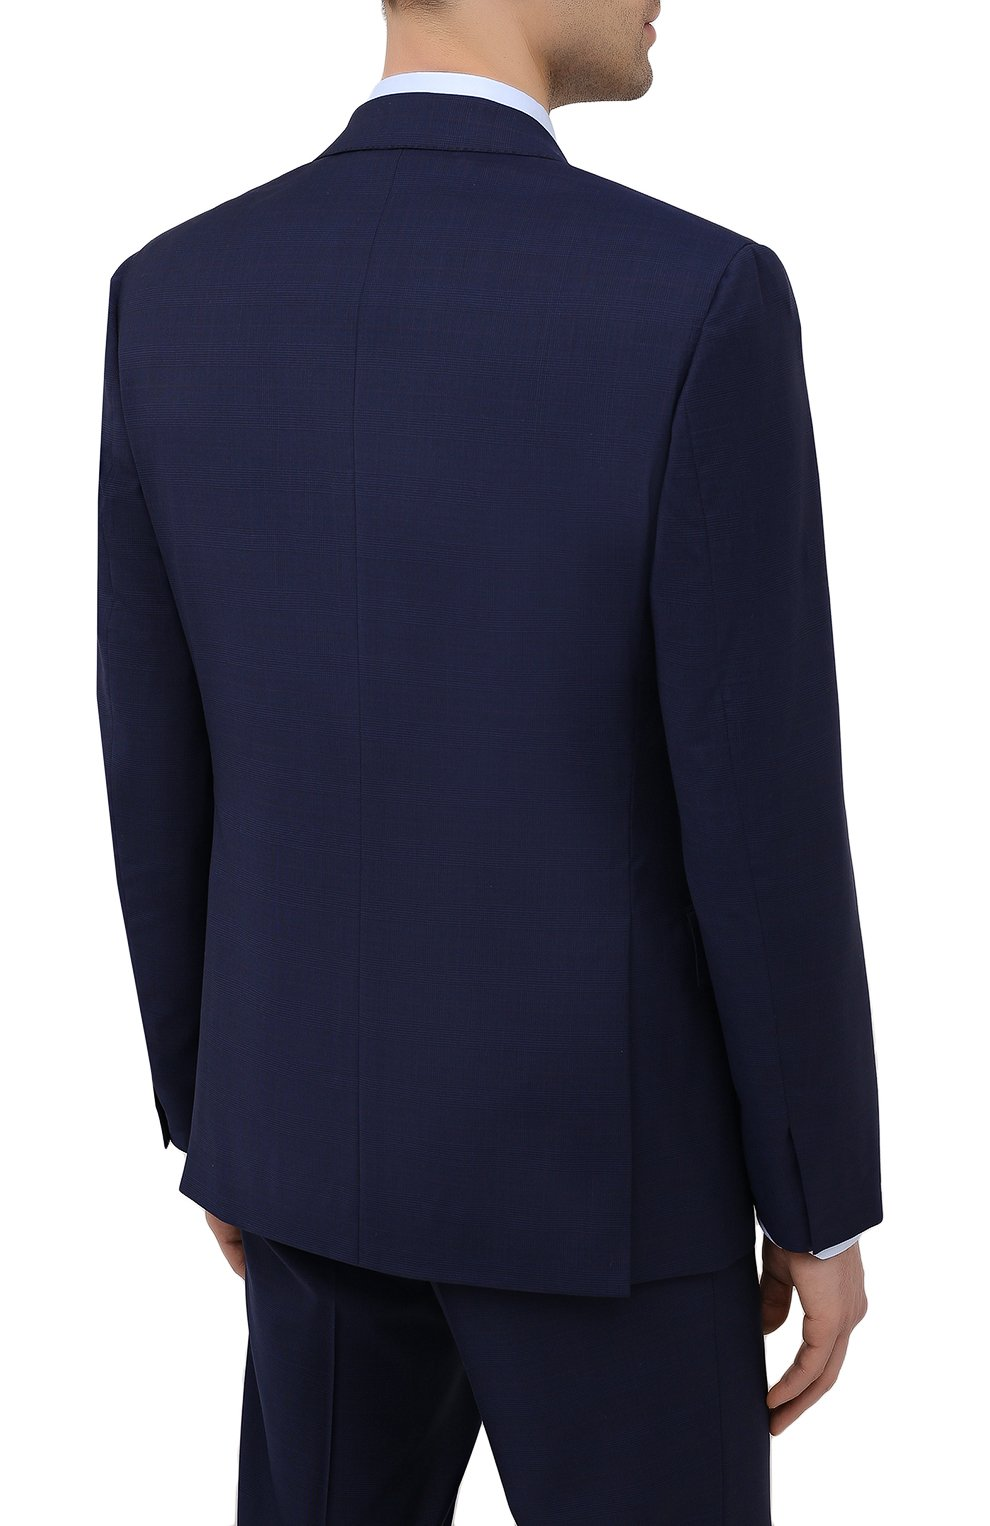 Мужской шерстяной костюм BRIONI синего цвета, арт. RA0B0U/P0A15/PRE C0UTURE | Фото 3